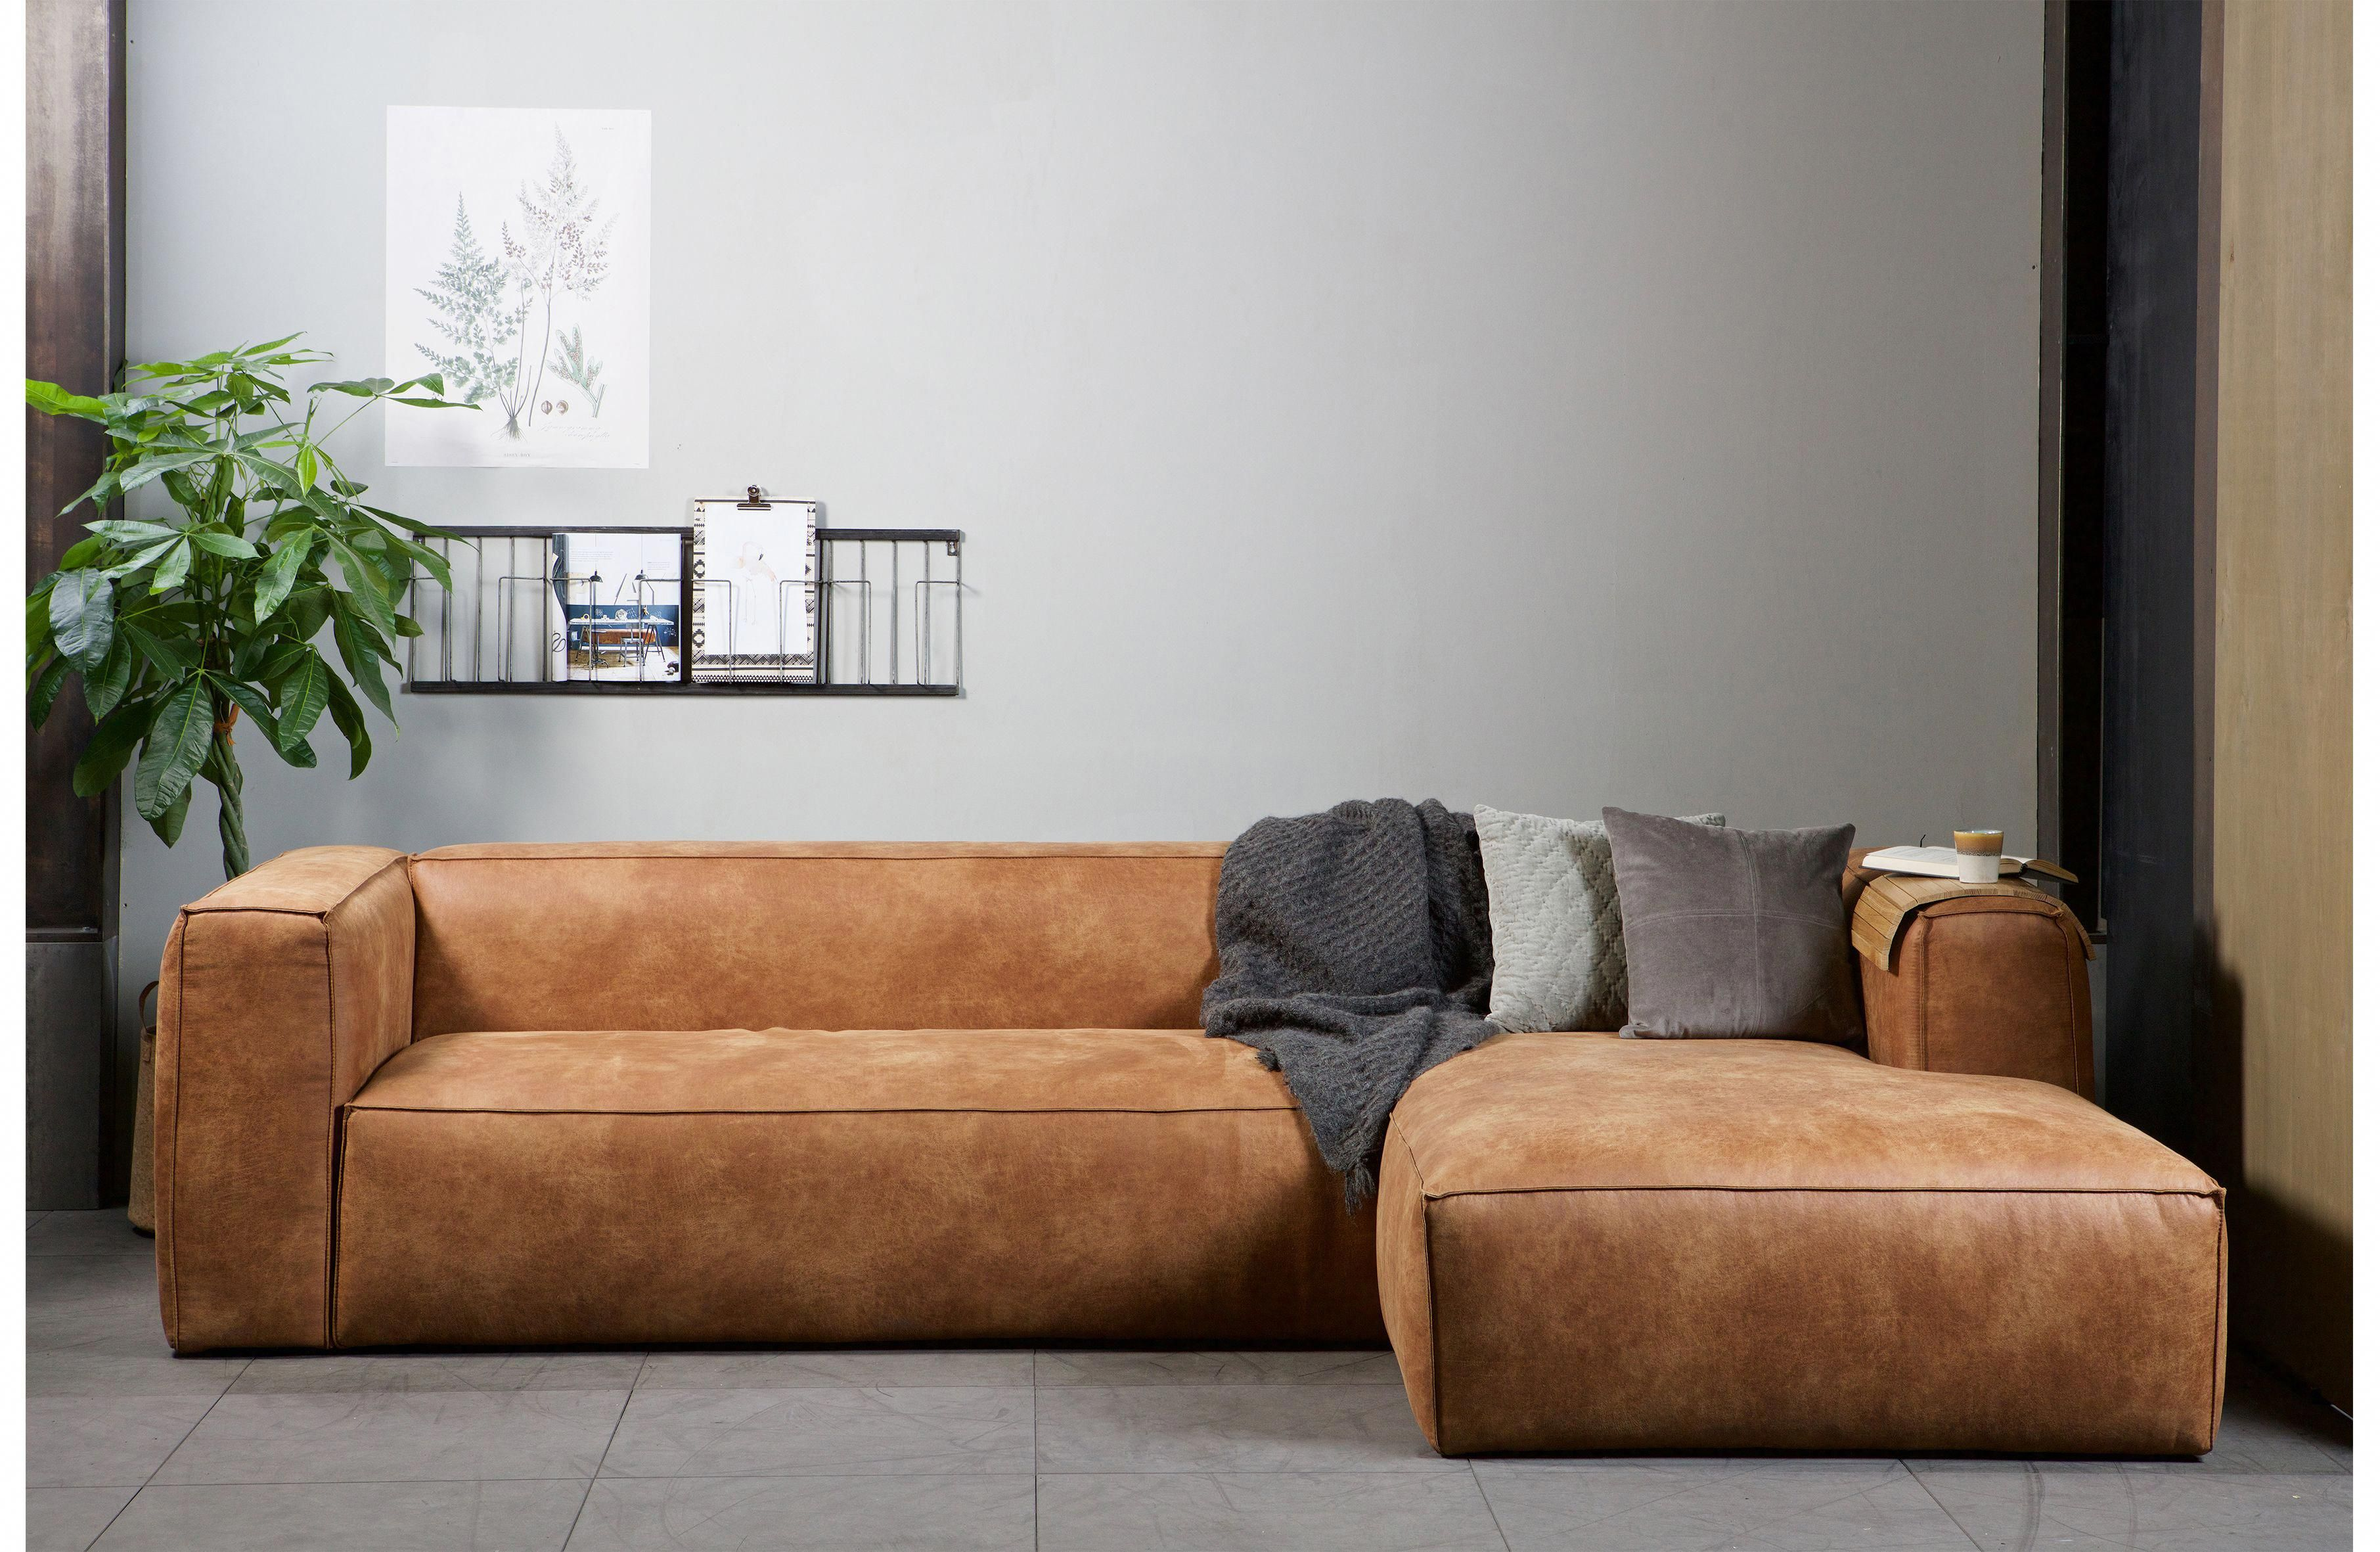 10 Fascinating Corner Sofas Sets Corner Sofa Seat Furniturecafe Furnitureclassic Cornersofa Leather Corner Sofa Bean Sofa Corner Sofa Set